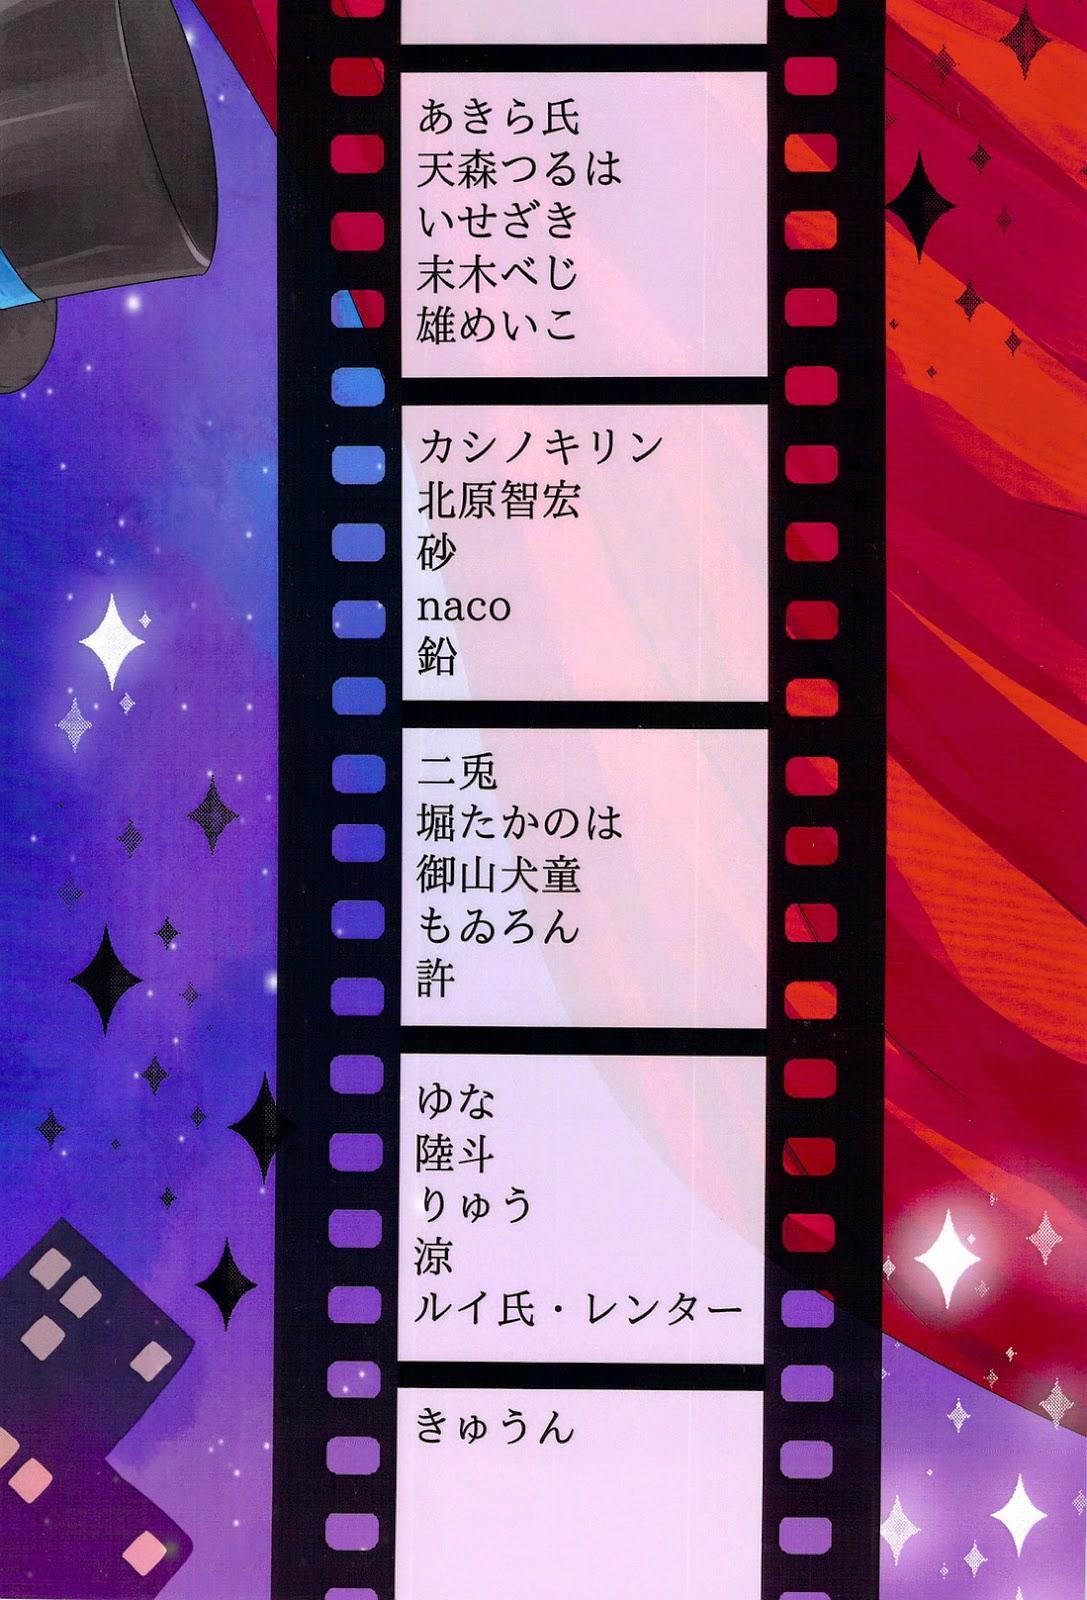 Shiba ShowTime 1